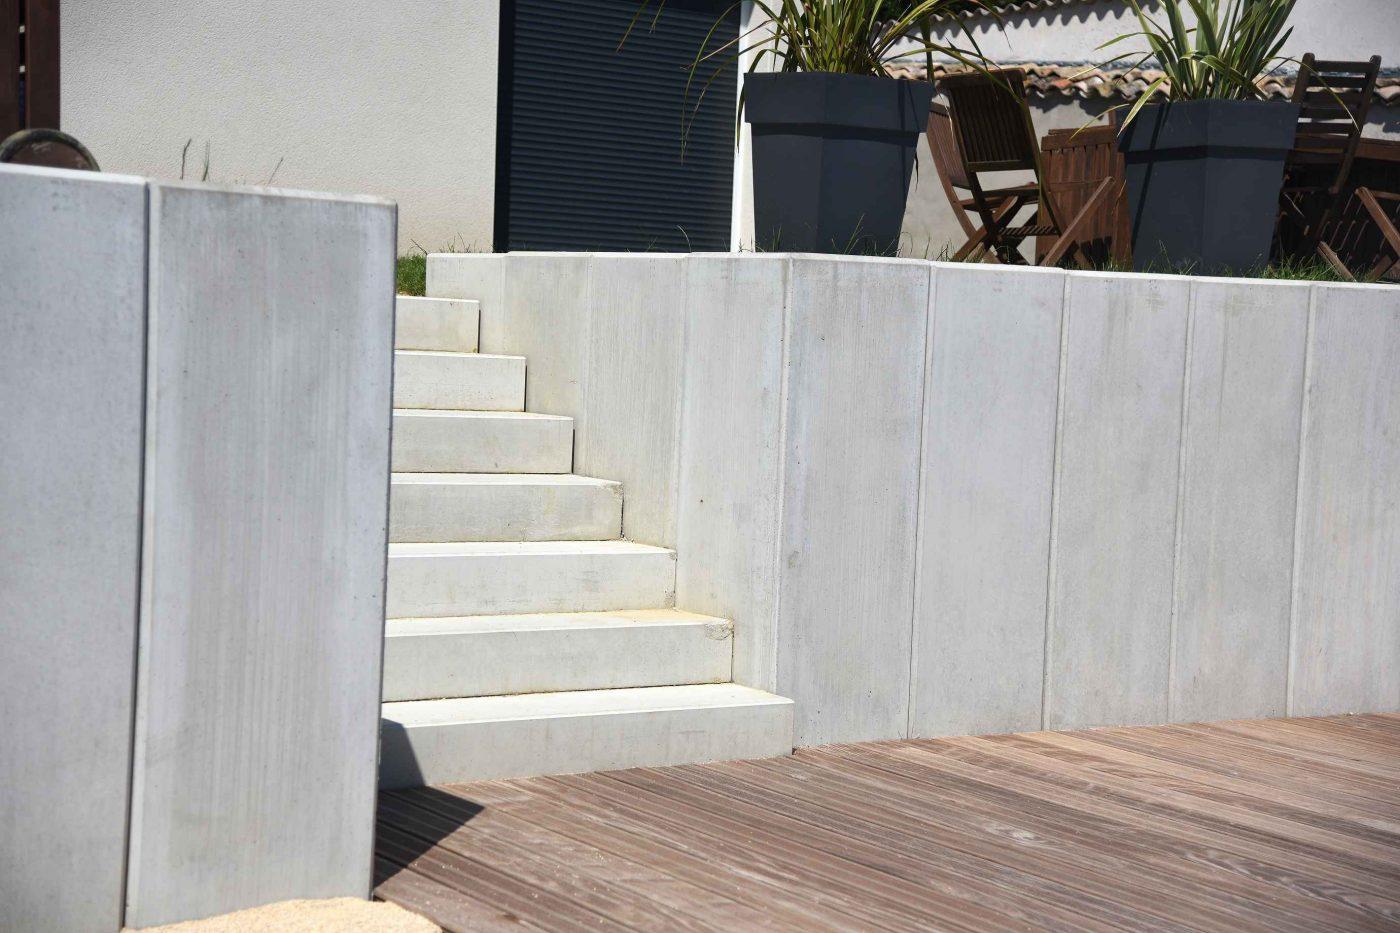 escalier pour terrasse/jardin